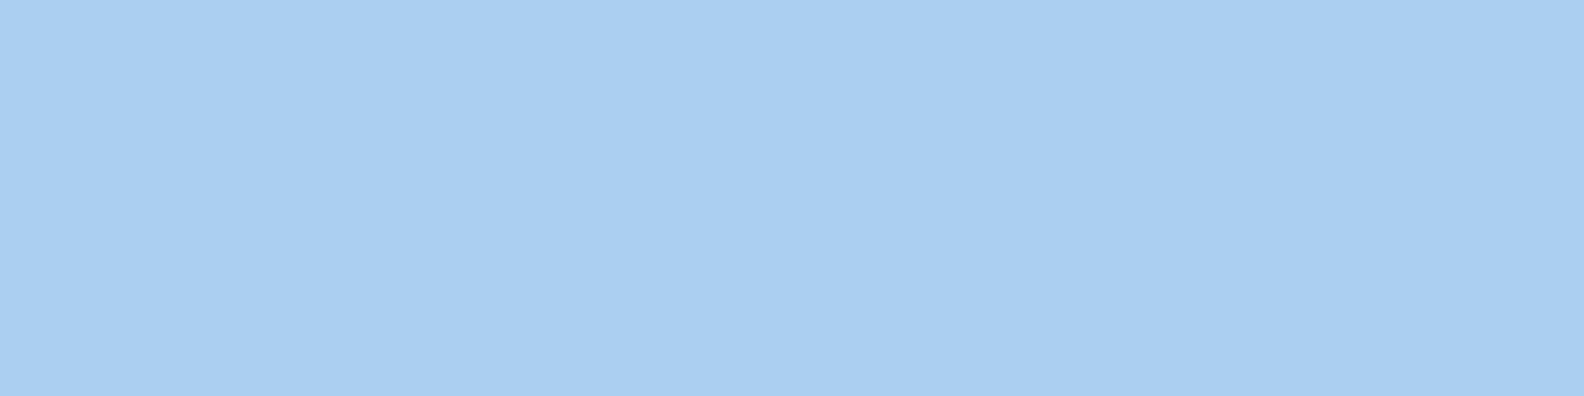 1584x396 Pale Cornflower Blue Solid Color Background